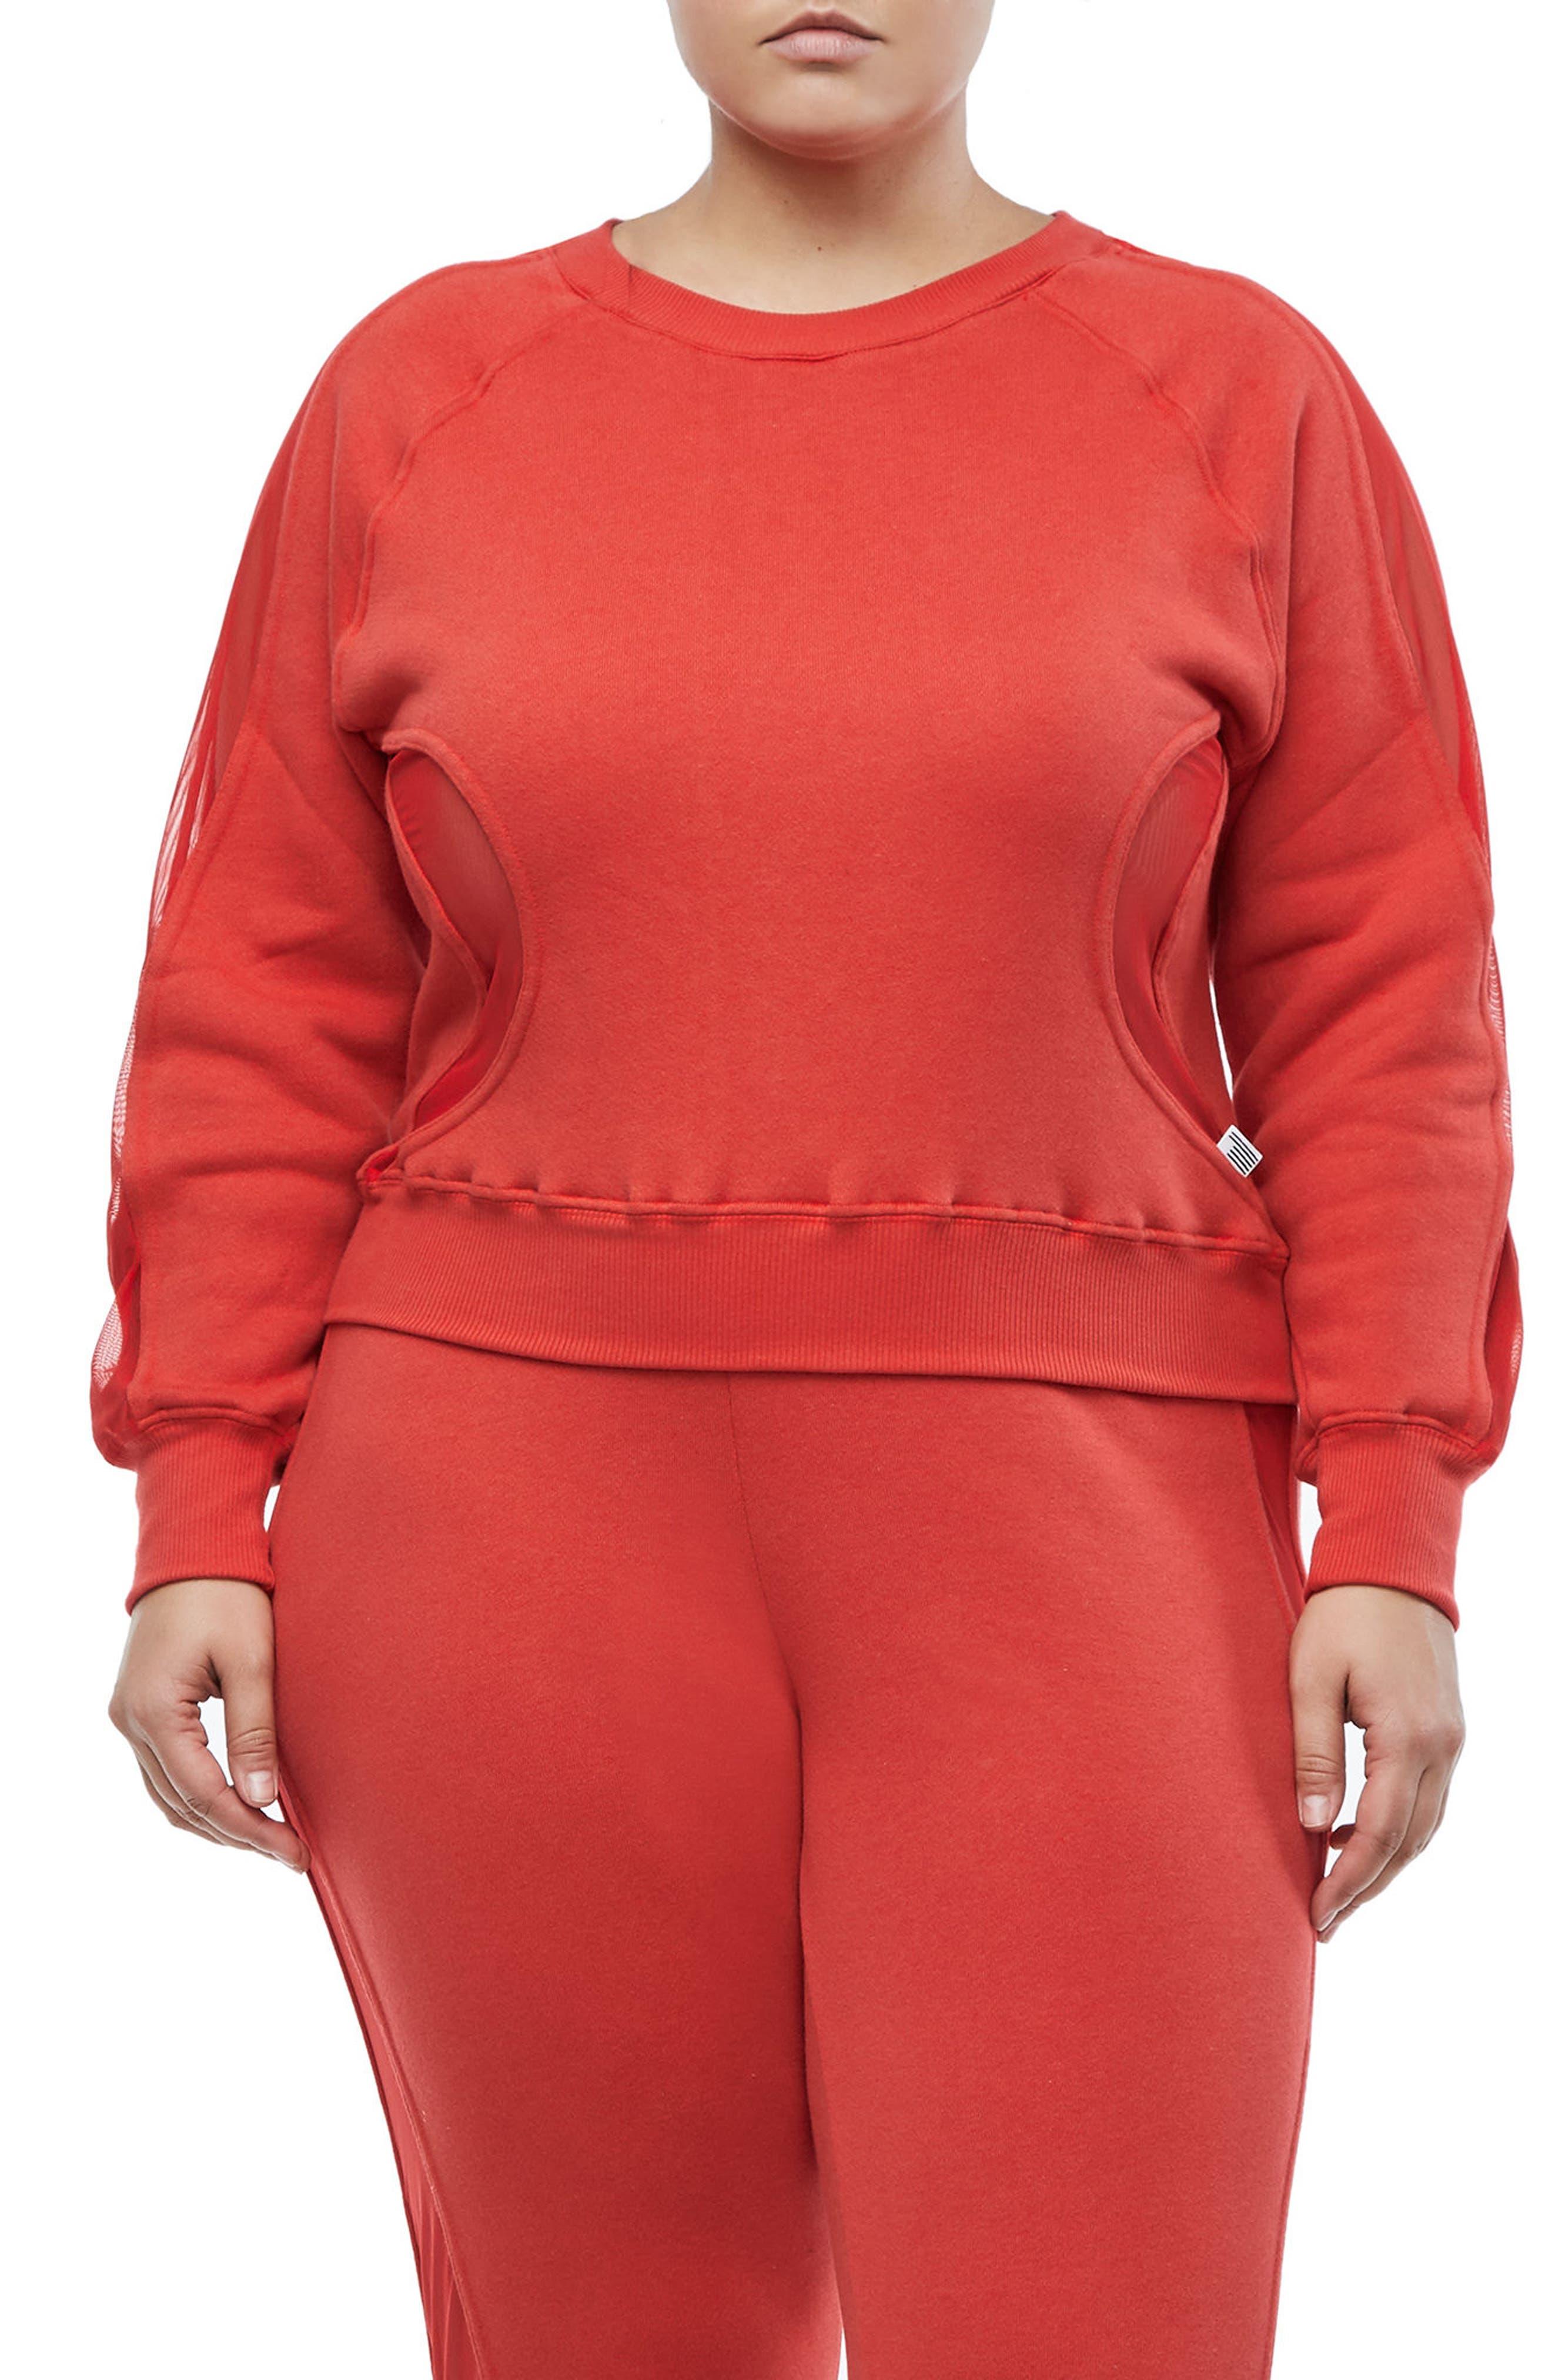 Good Sweats Mesh Inset Sweatshirt,                             Main thumbnail 2, color,